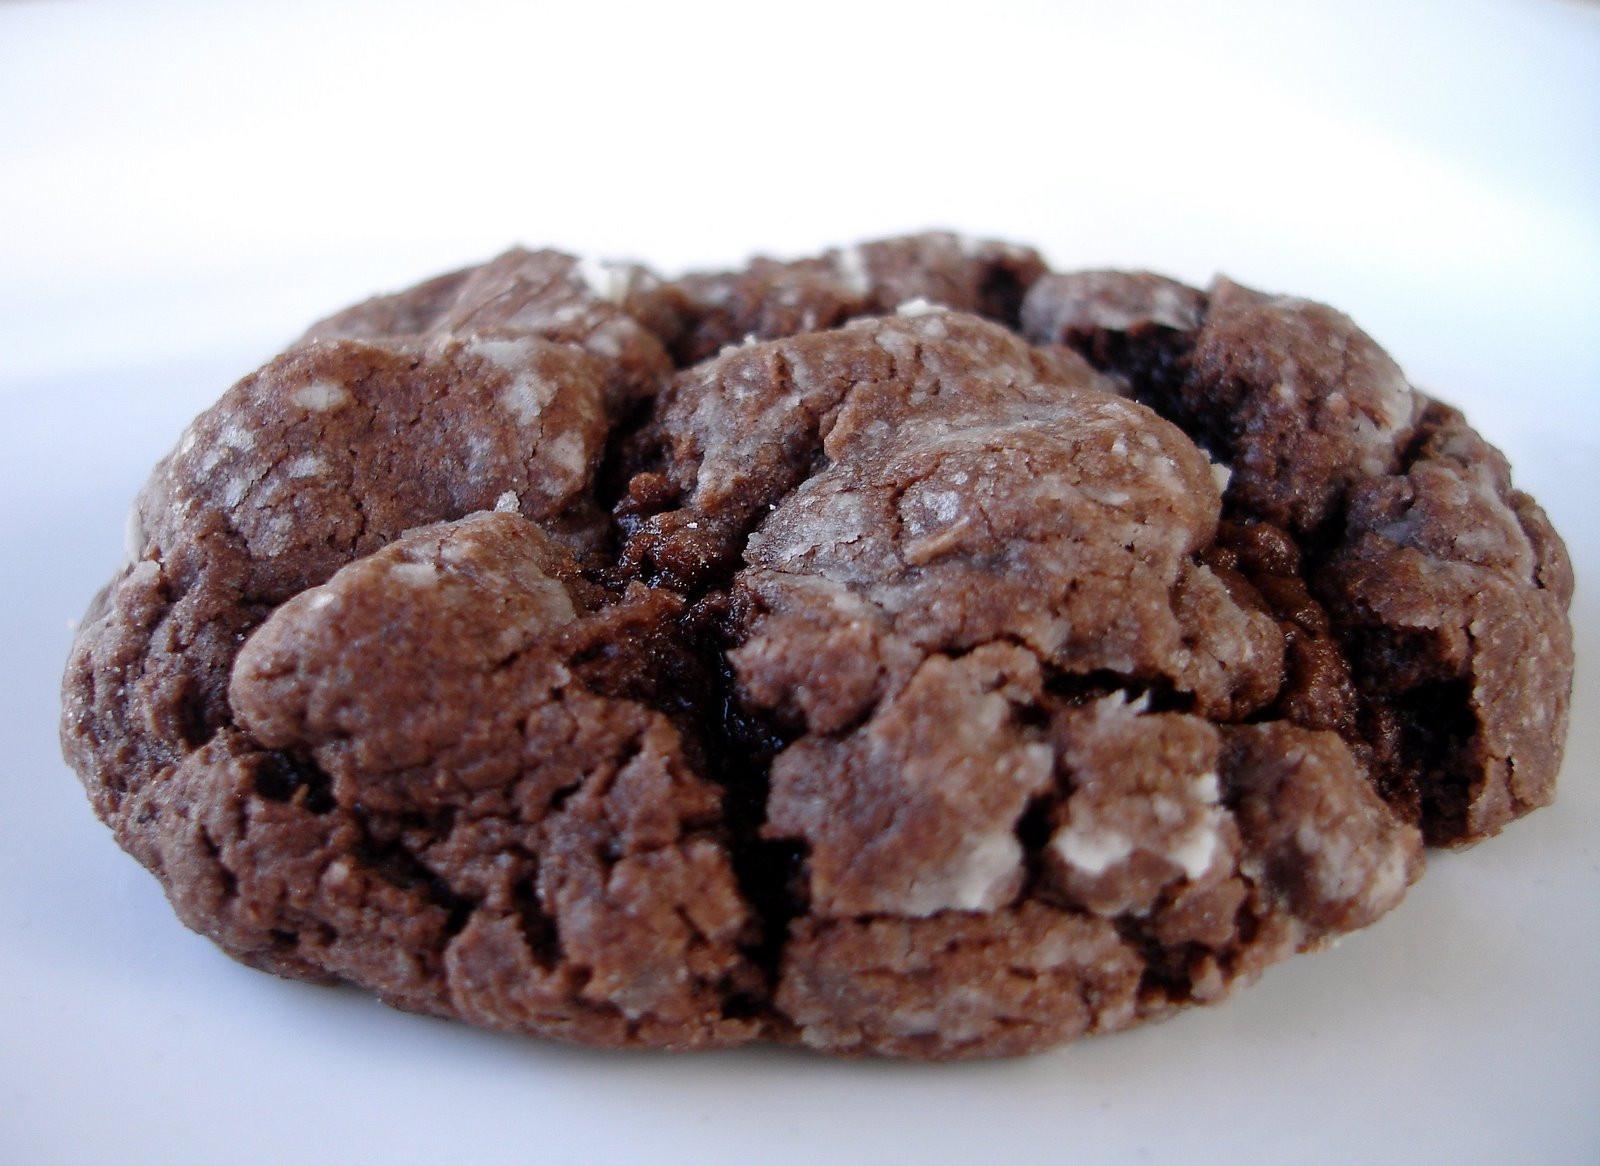 Ooey Gooey Butter Cookies  Chocolate Ooey Gooey Butter Cookies The Girl Who Ate